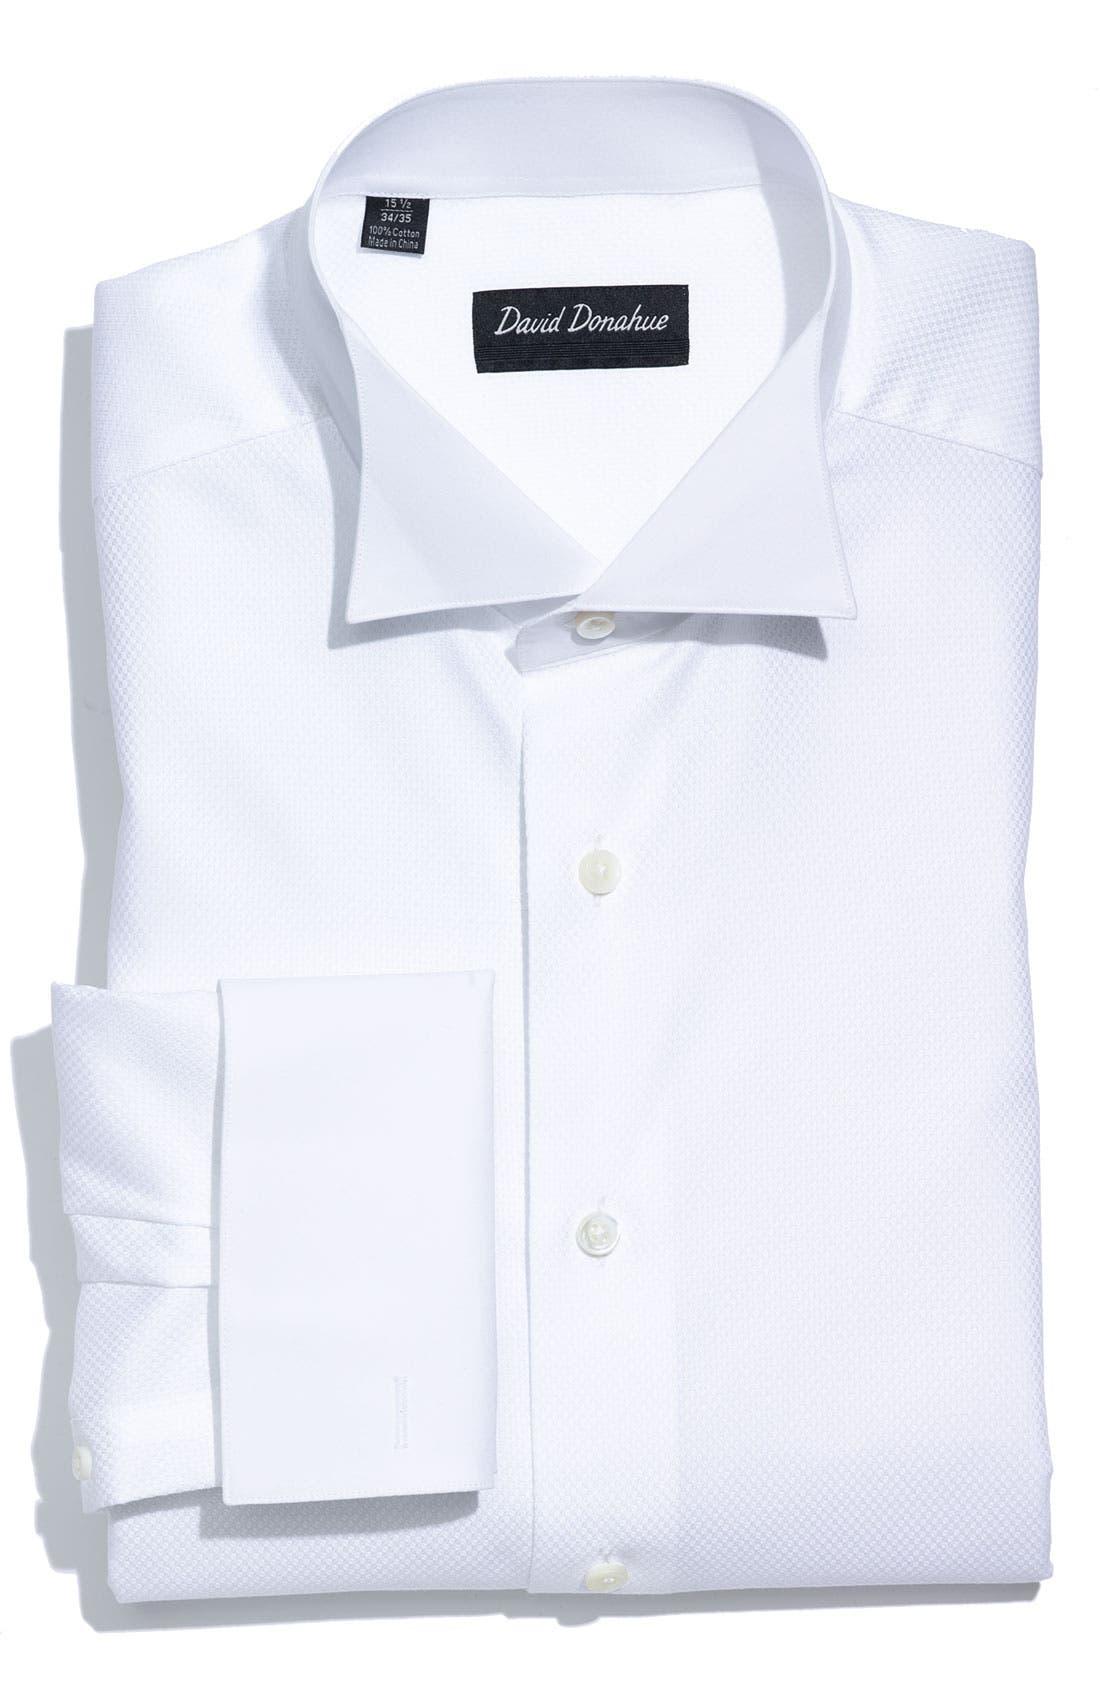 Main Image - David Donahue Regular Fit Tuxedo Shirt